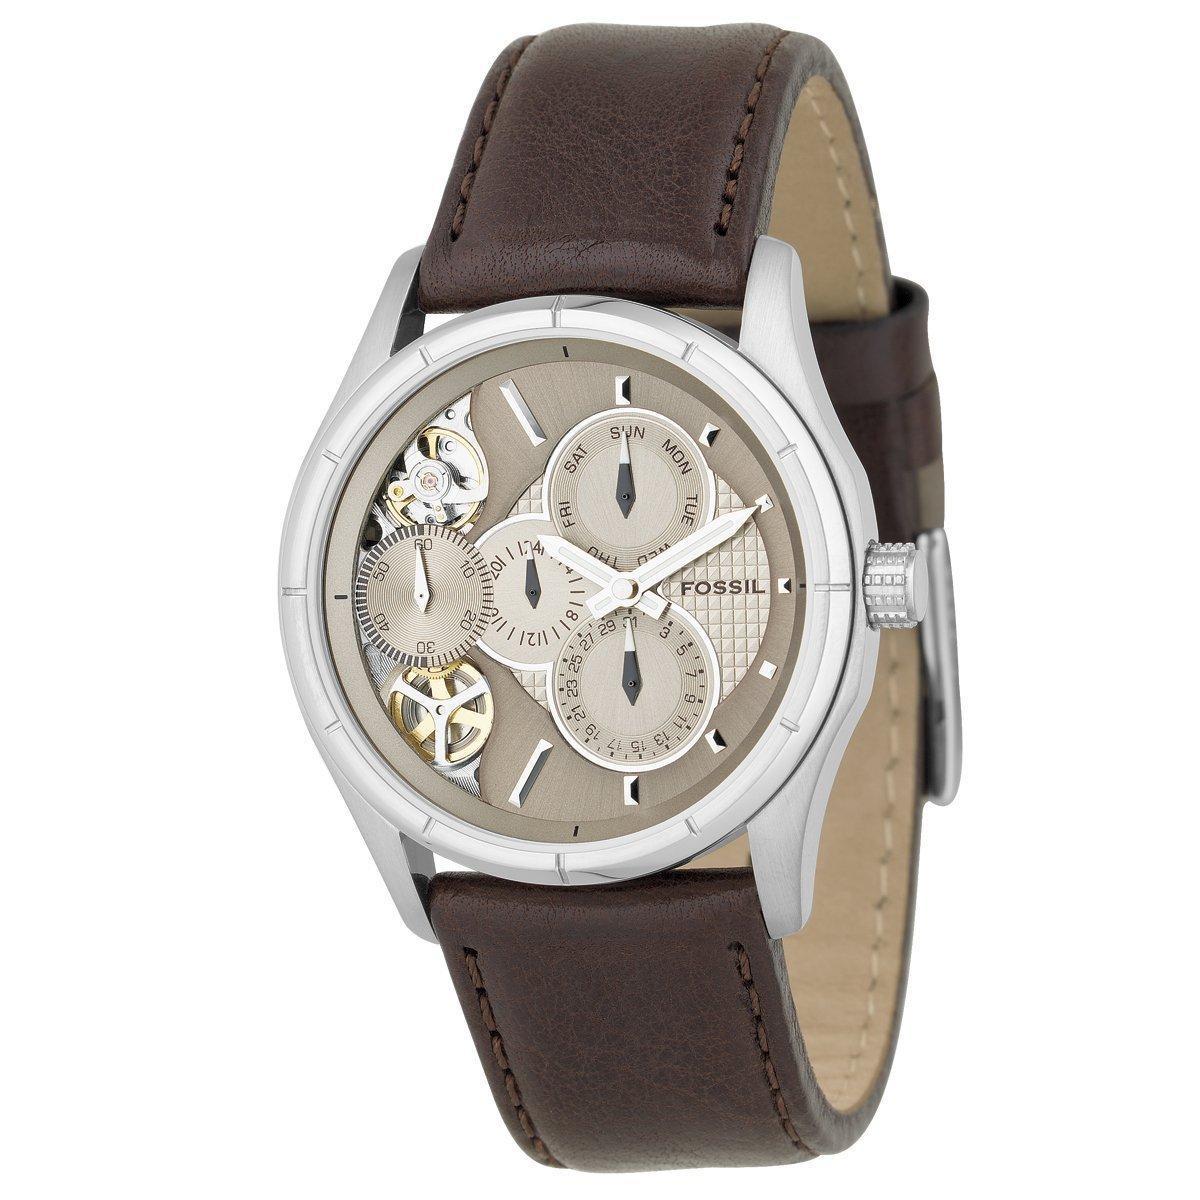 Fossil Men's ME1020 Stainless Steel Mechanical Twist Watch